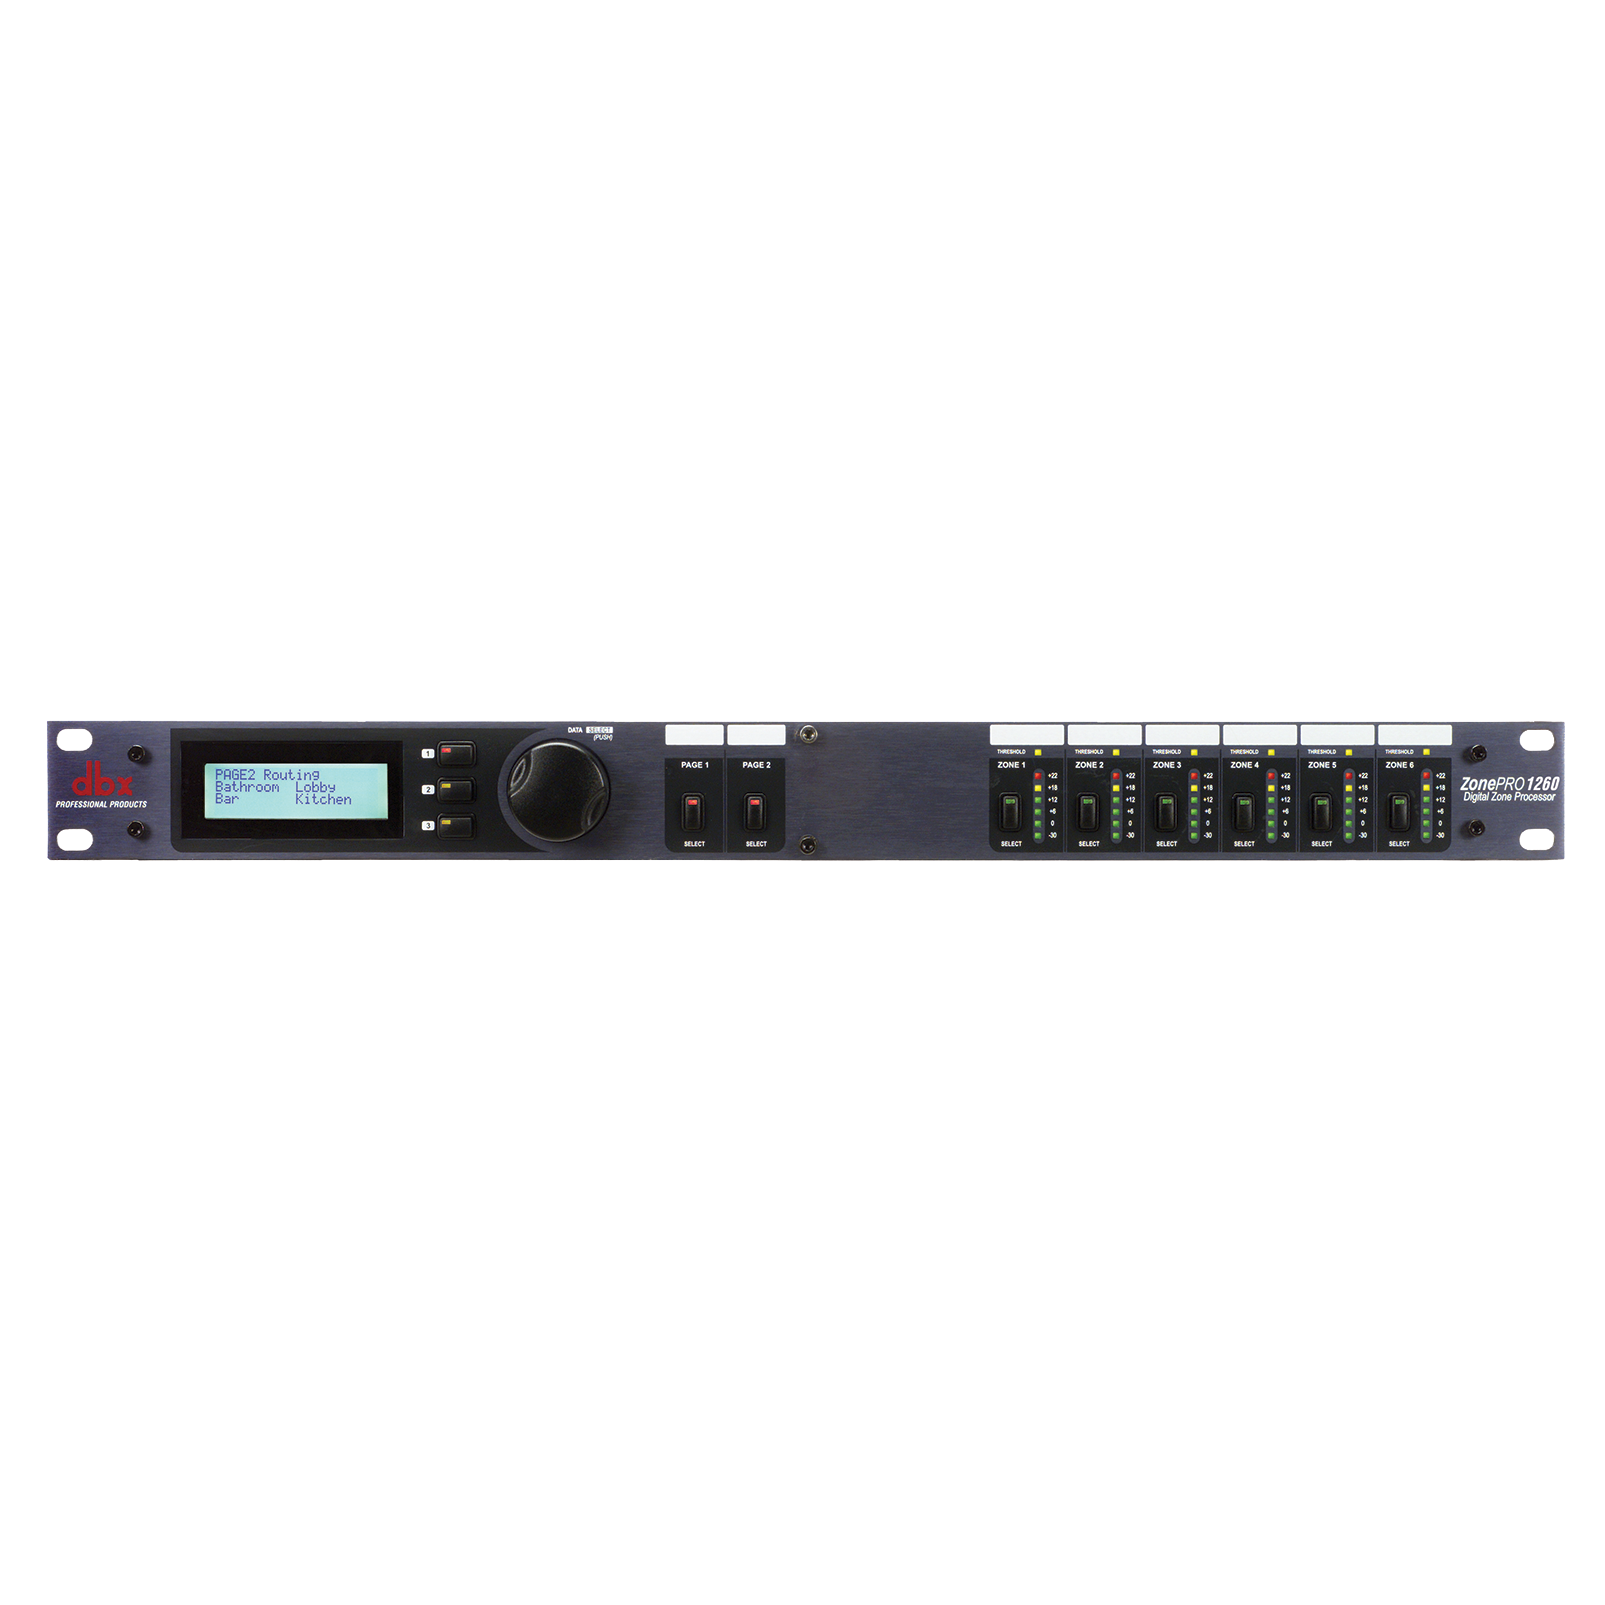 ZonePro 1260 - Black - 12x6 Digital Zone Processor - Hero